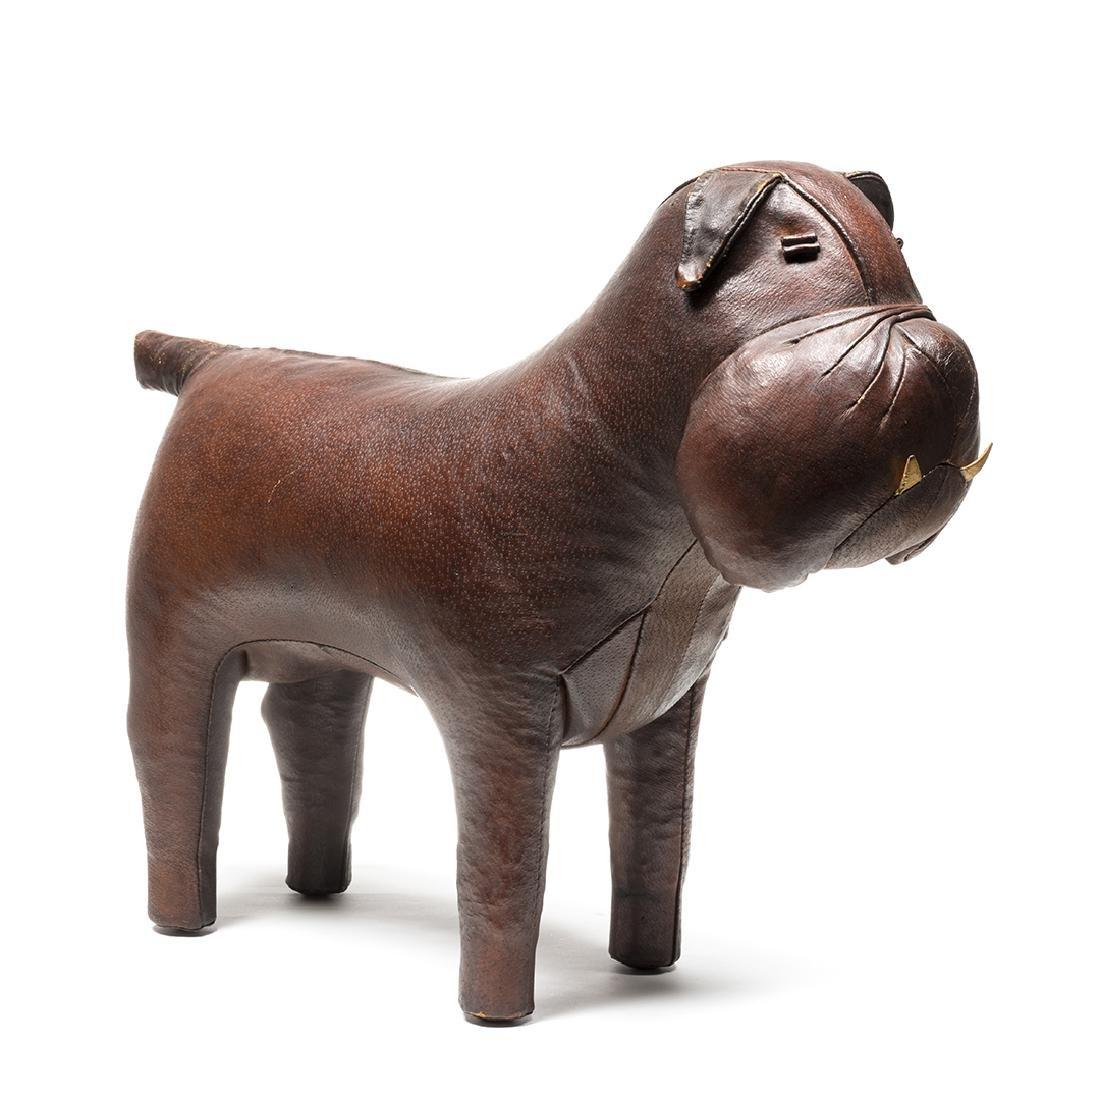 Dimitri Omersa Leather Bulldog